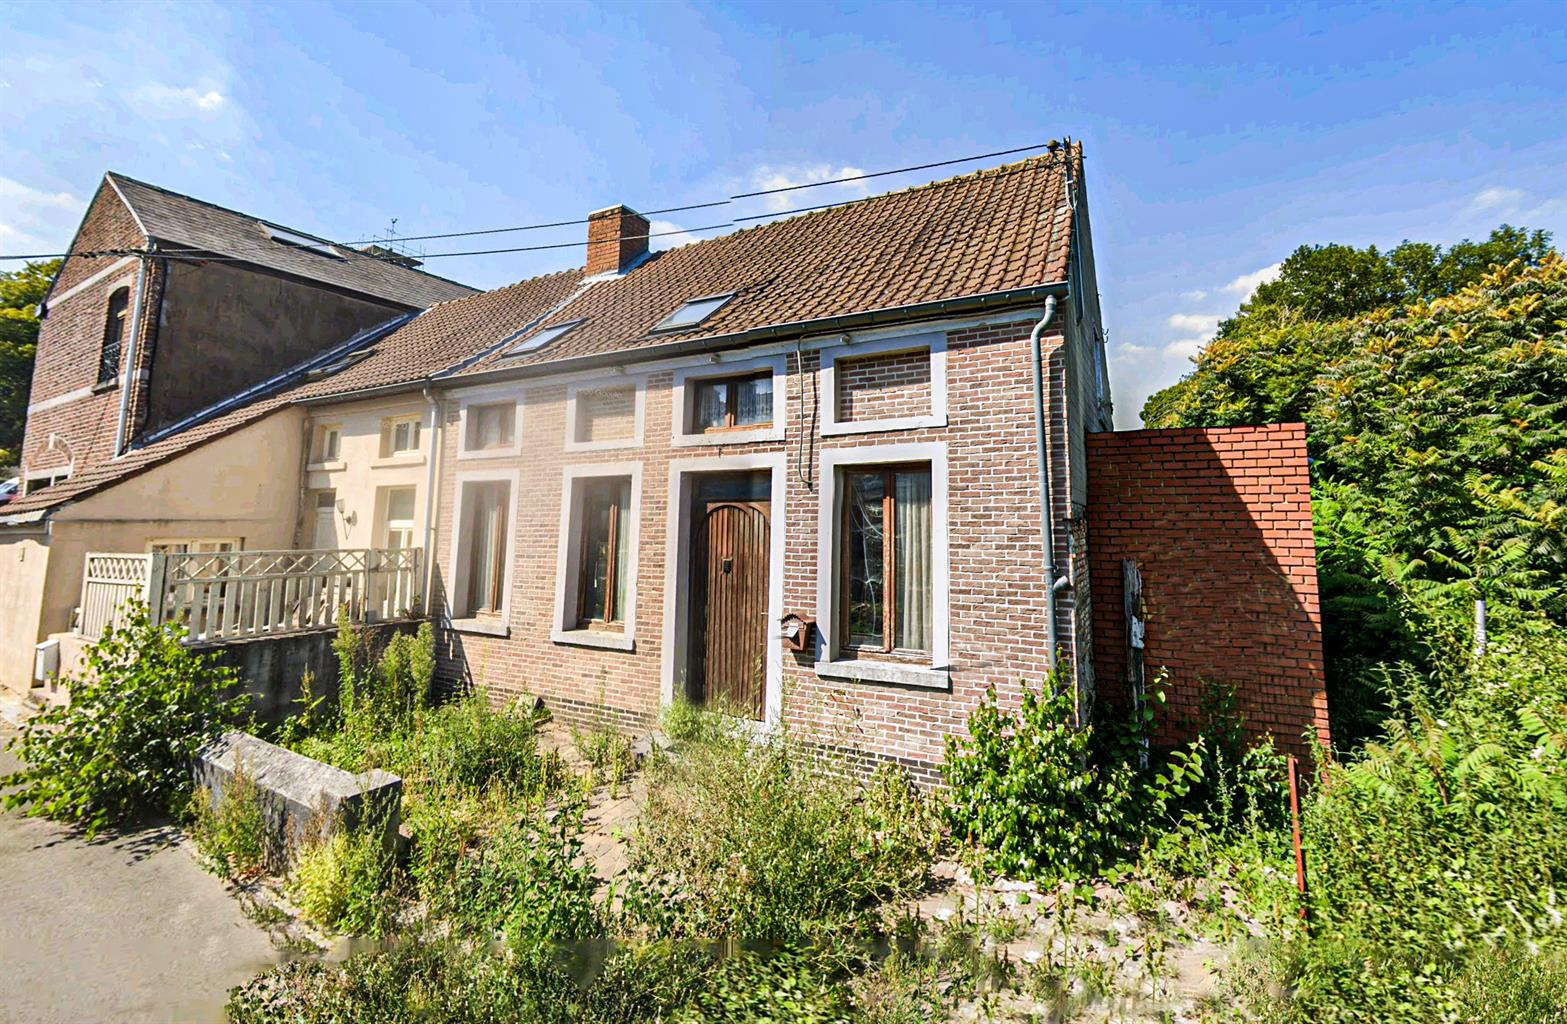 Maison - Tubize Oisquercq - #4398600-0